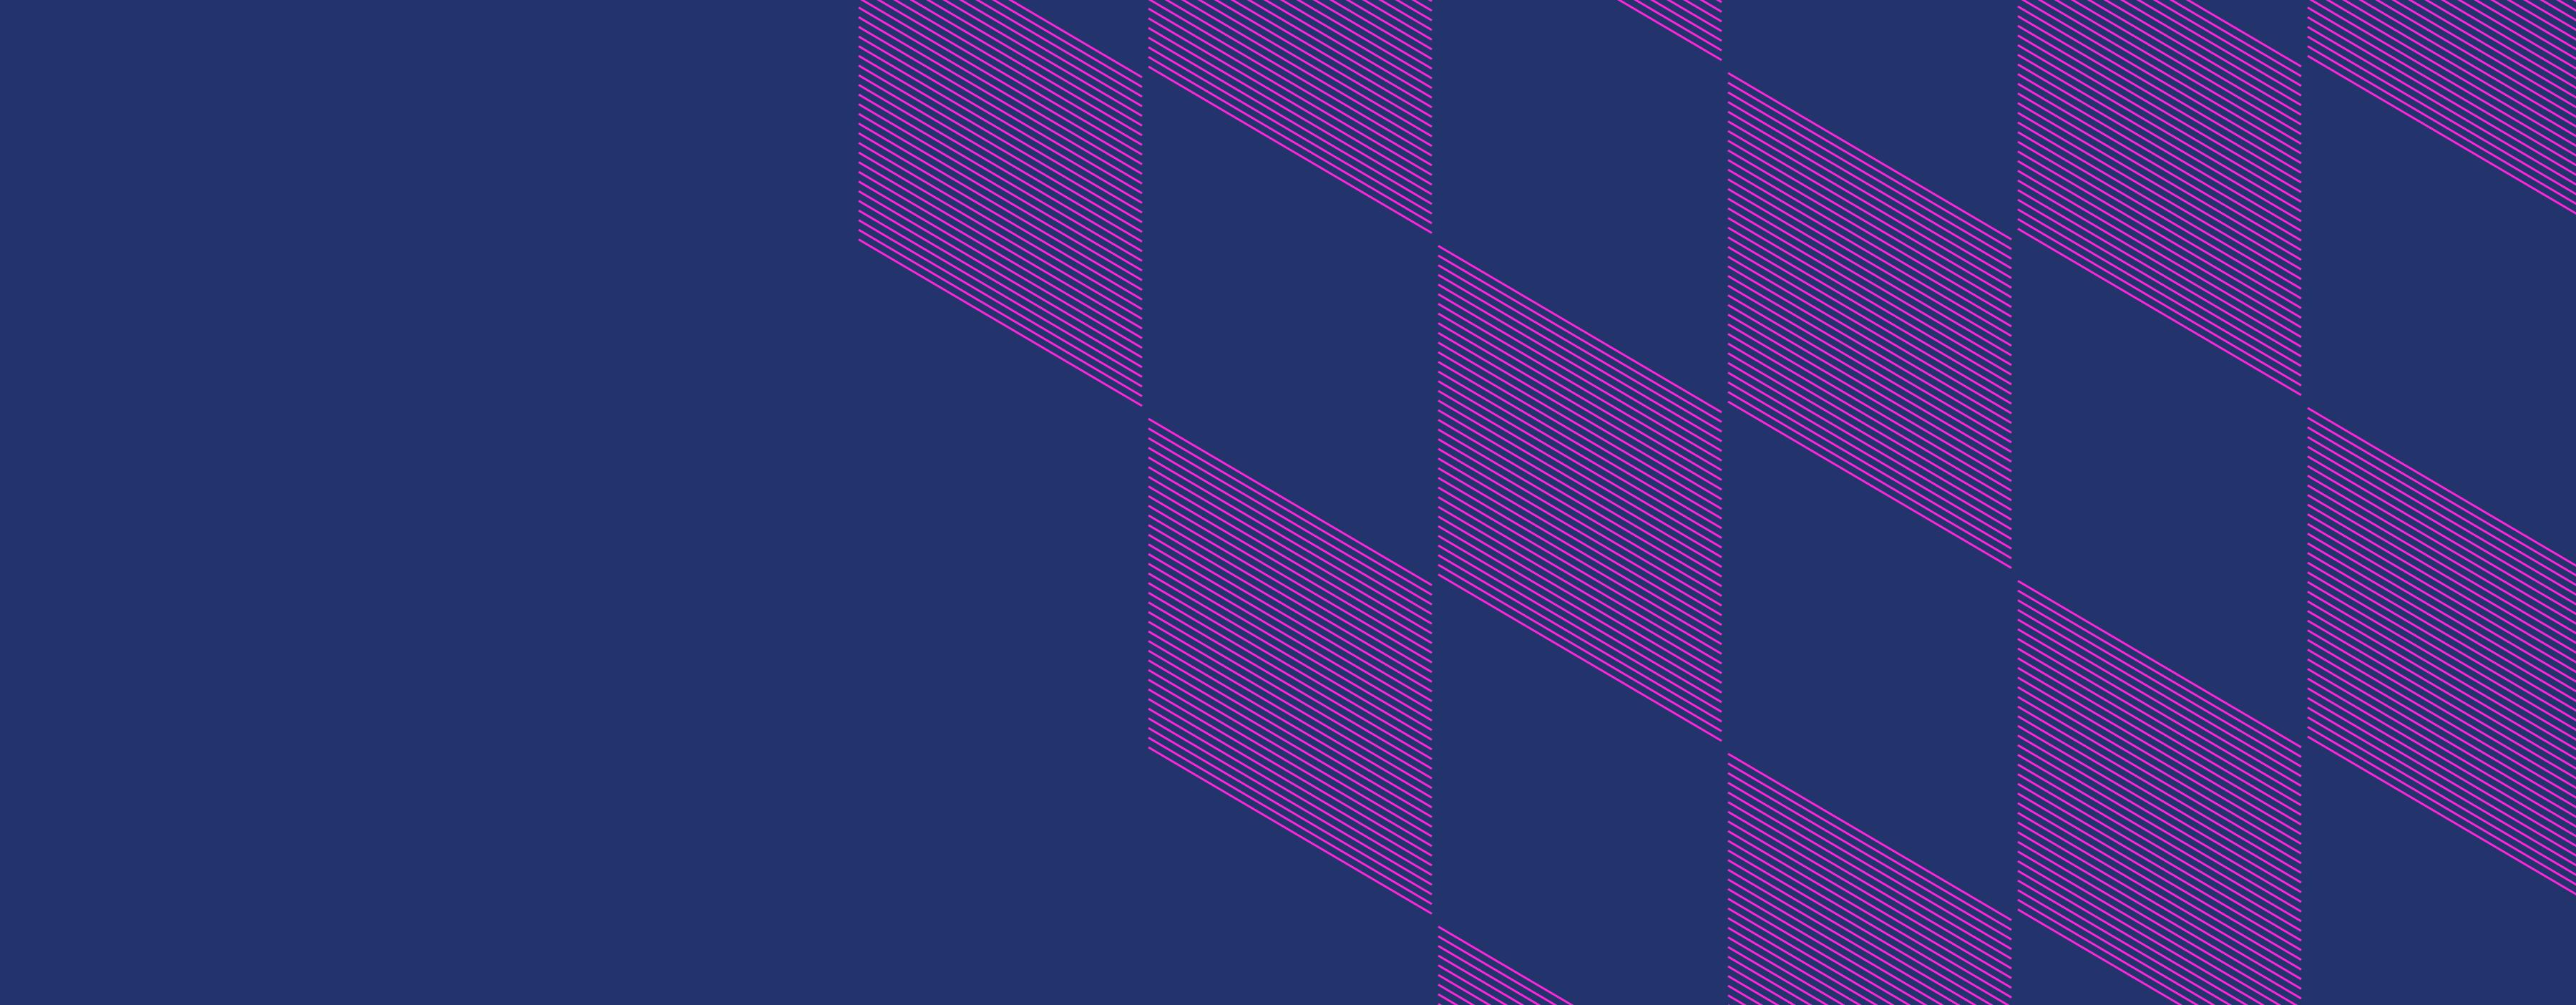 A decorative pattern